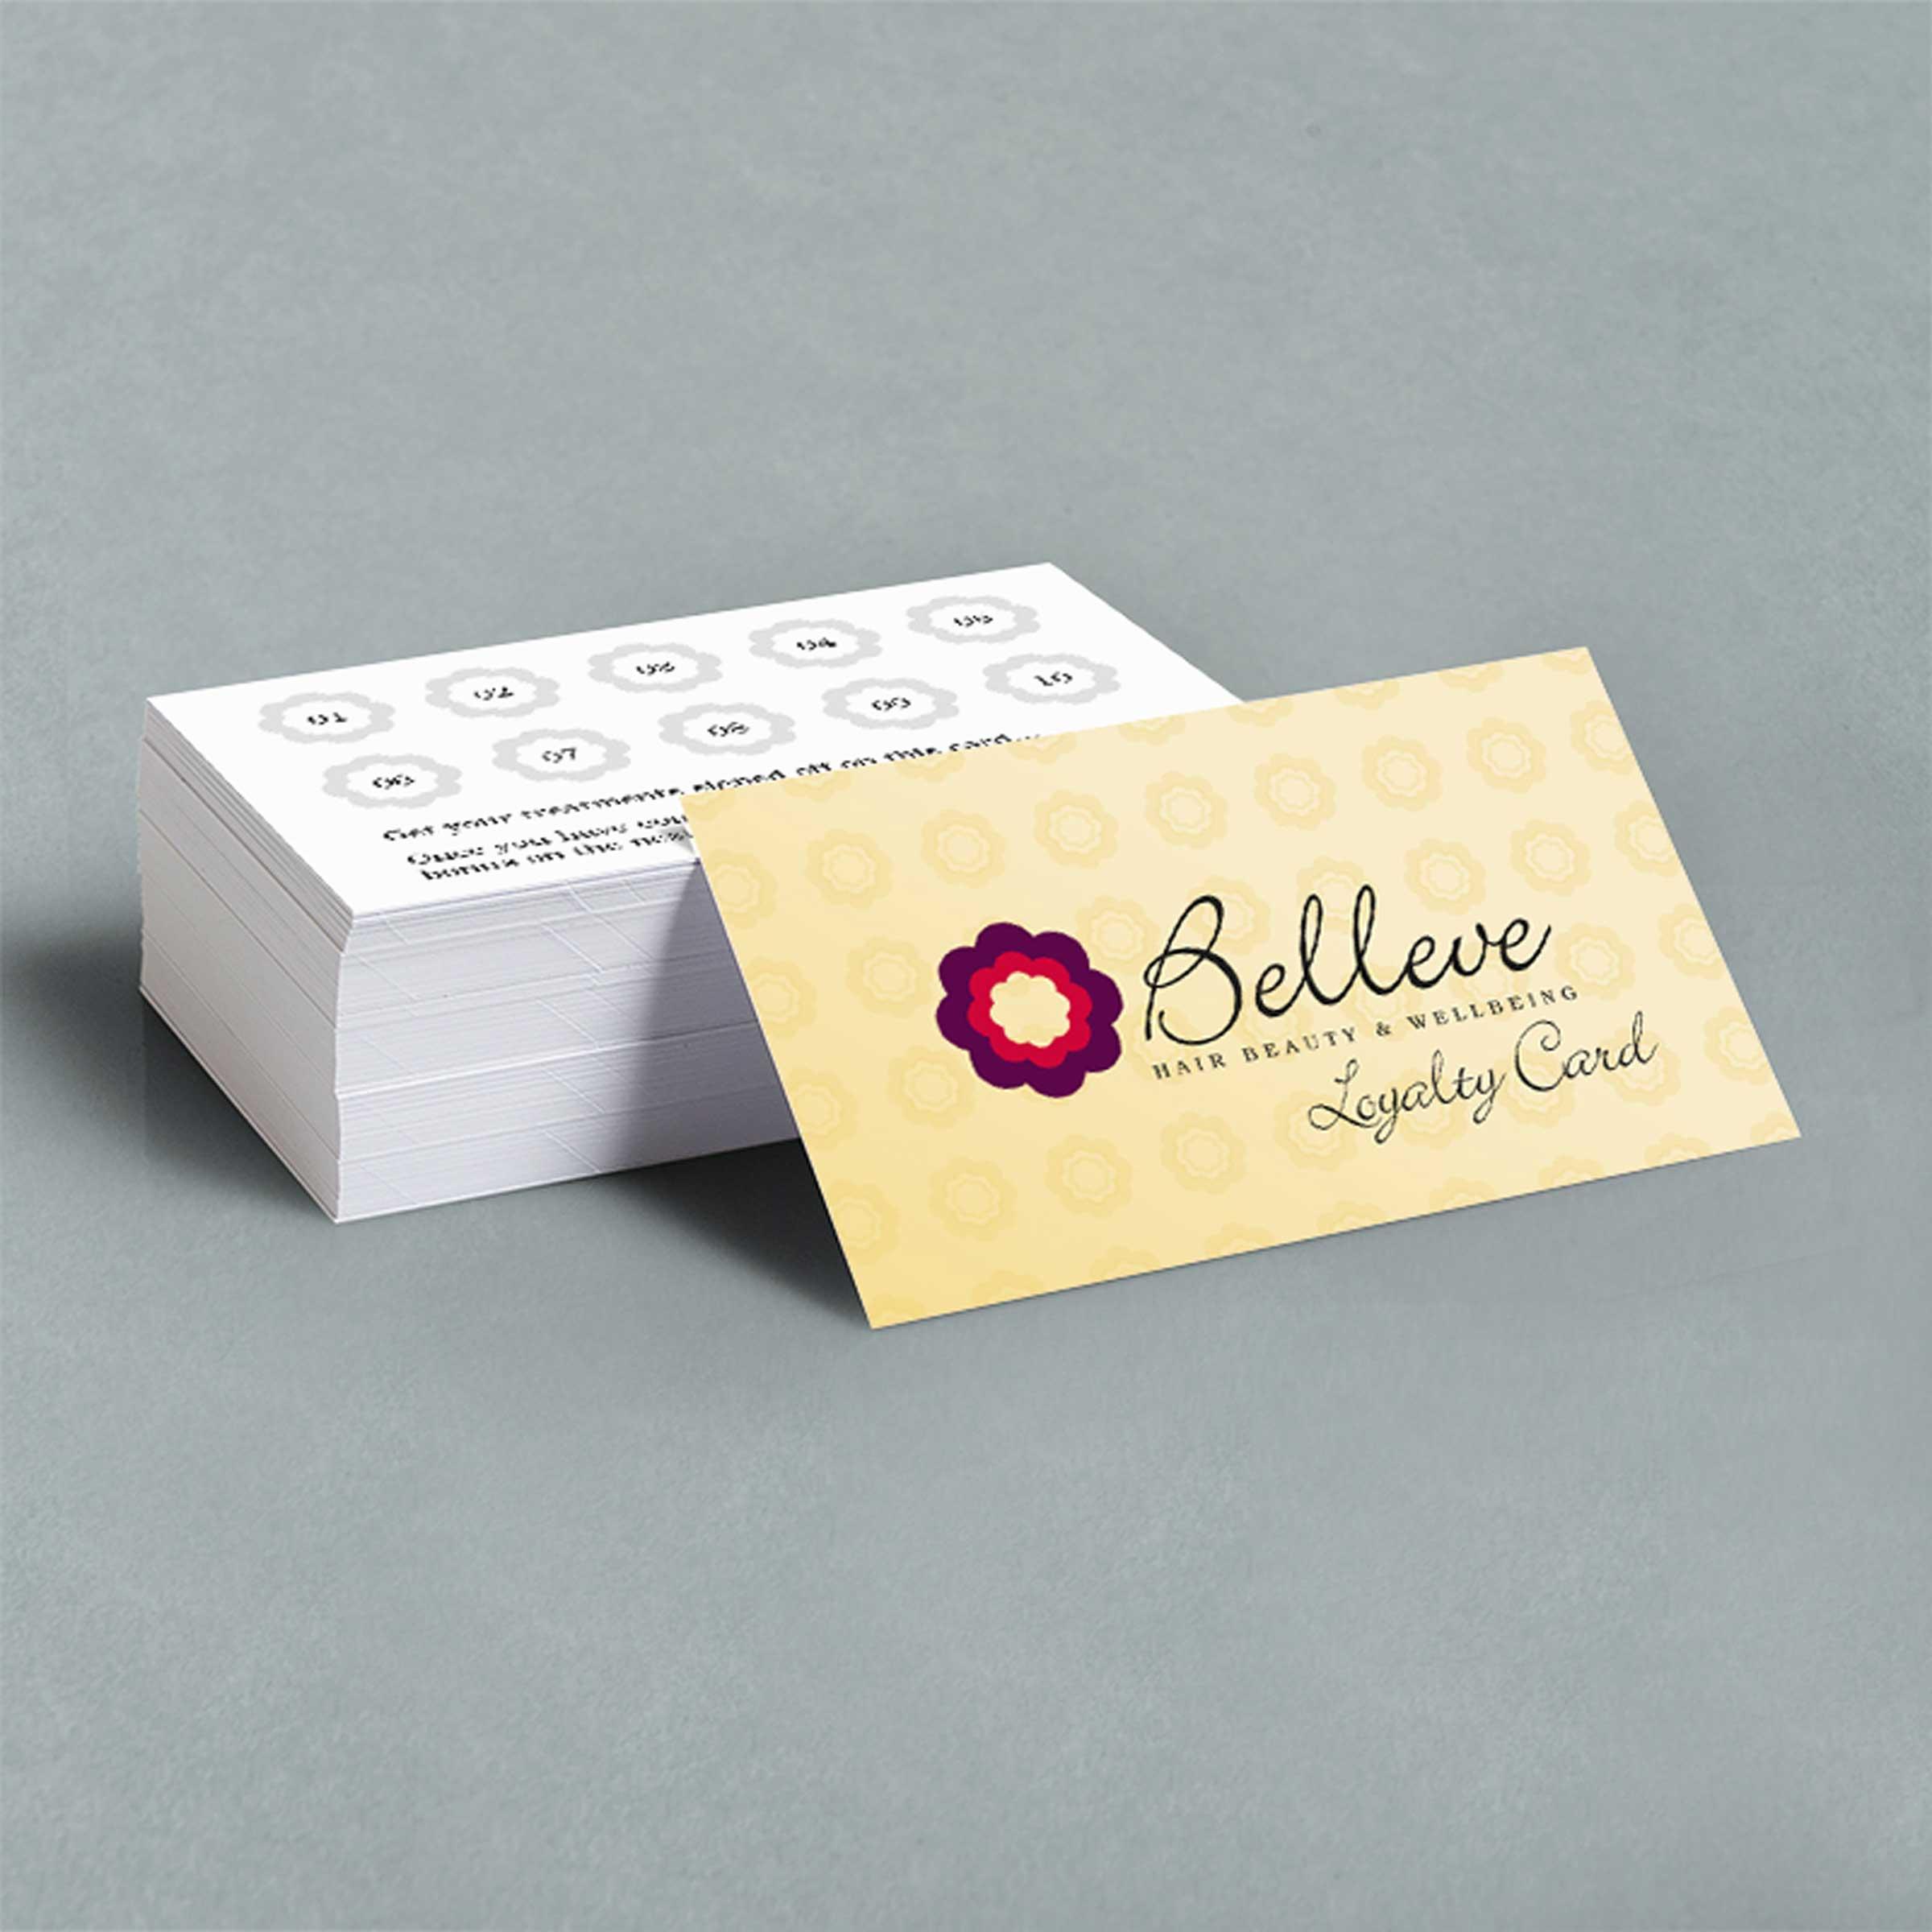 Belleve_Loyalty_Card